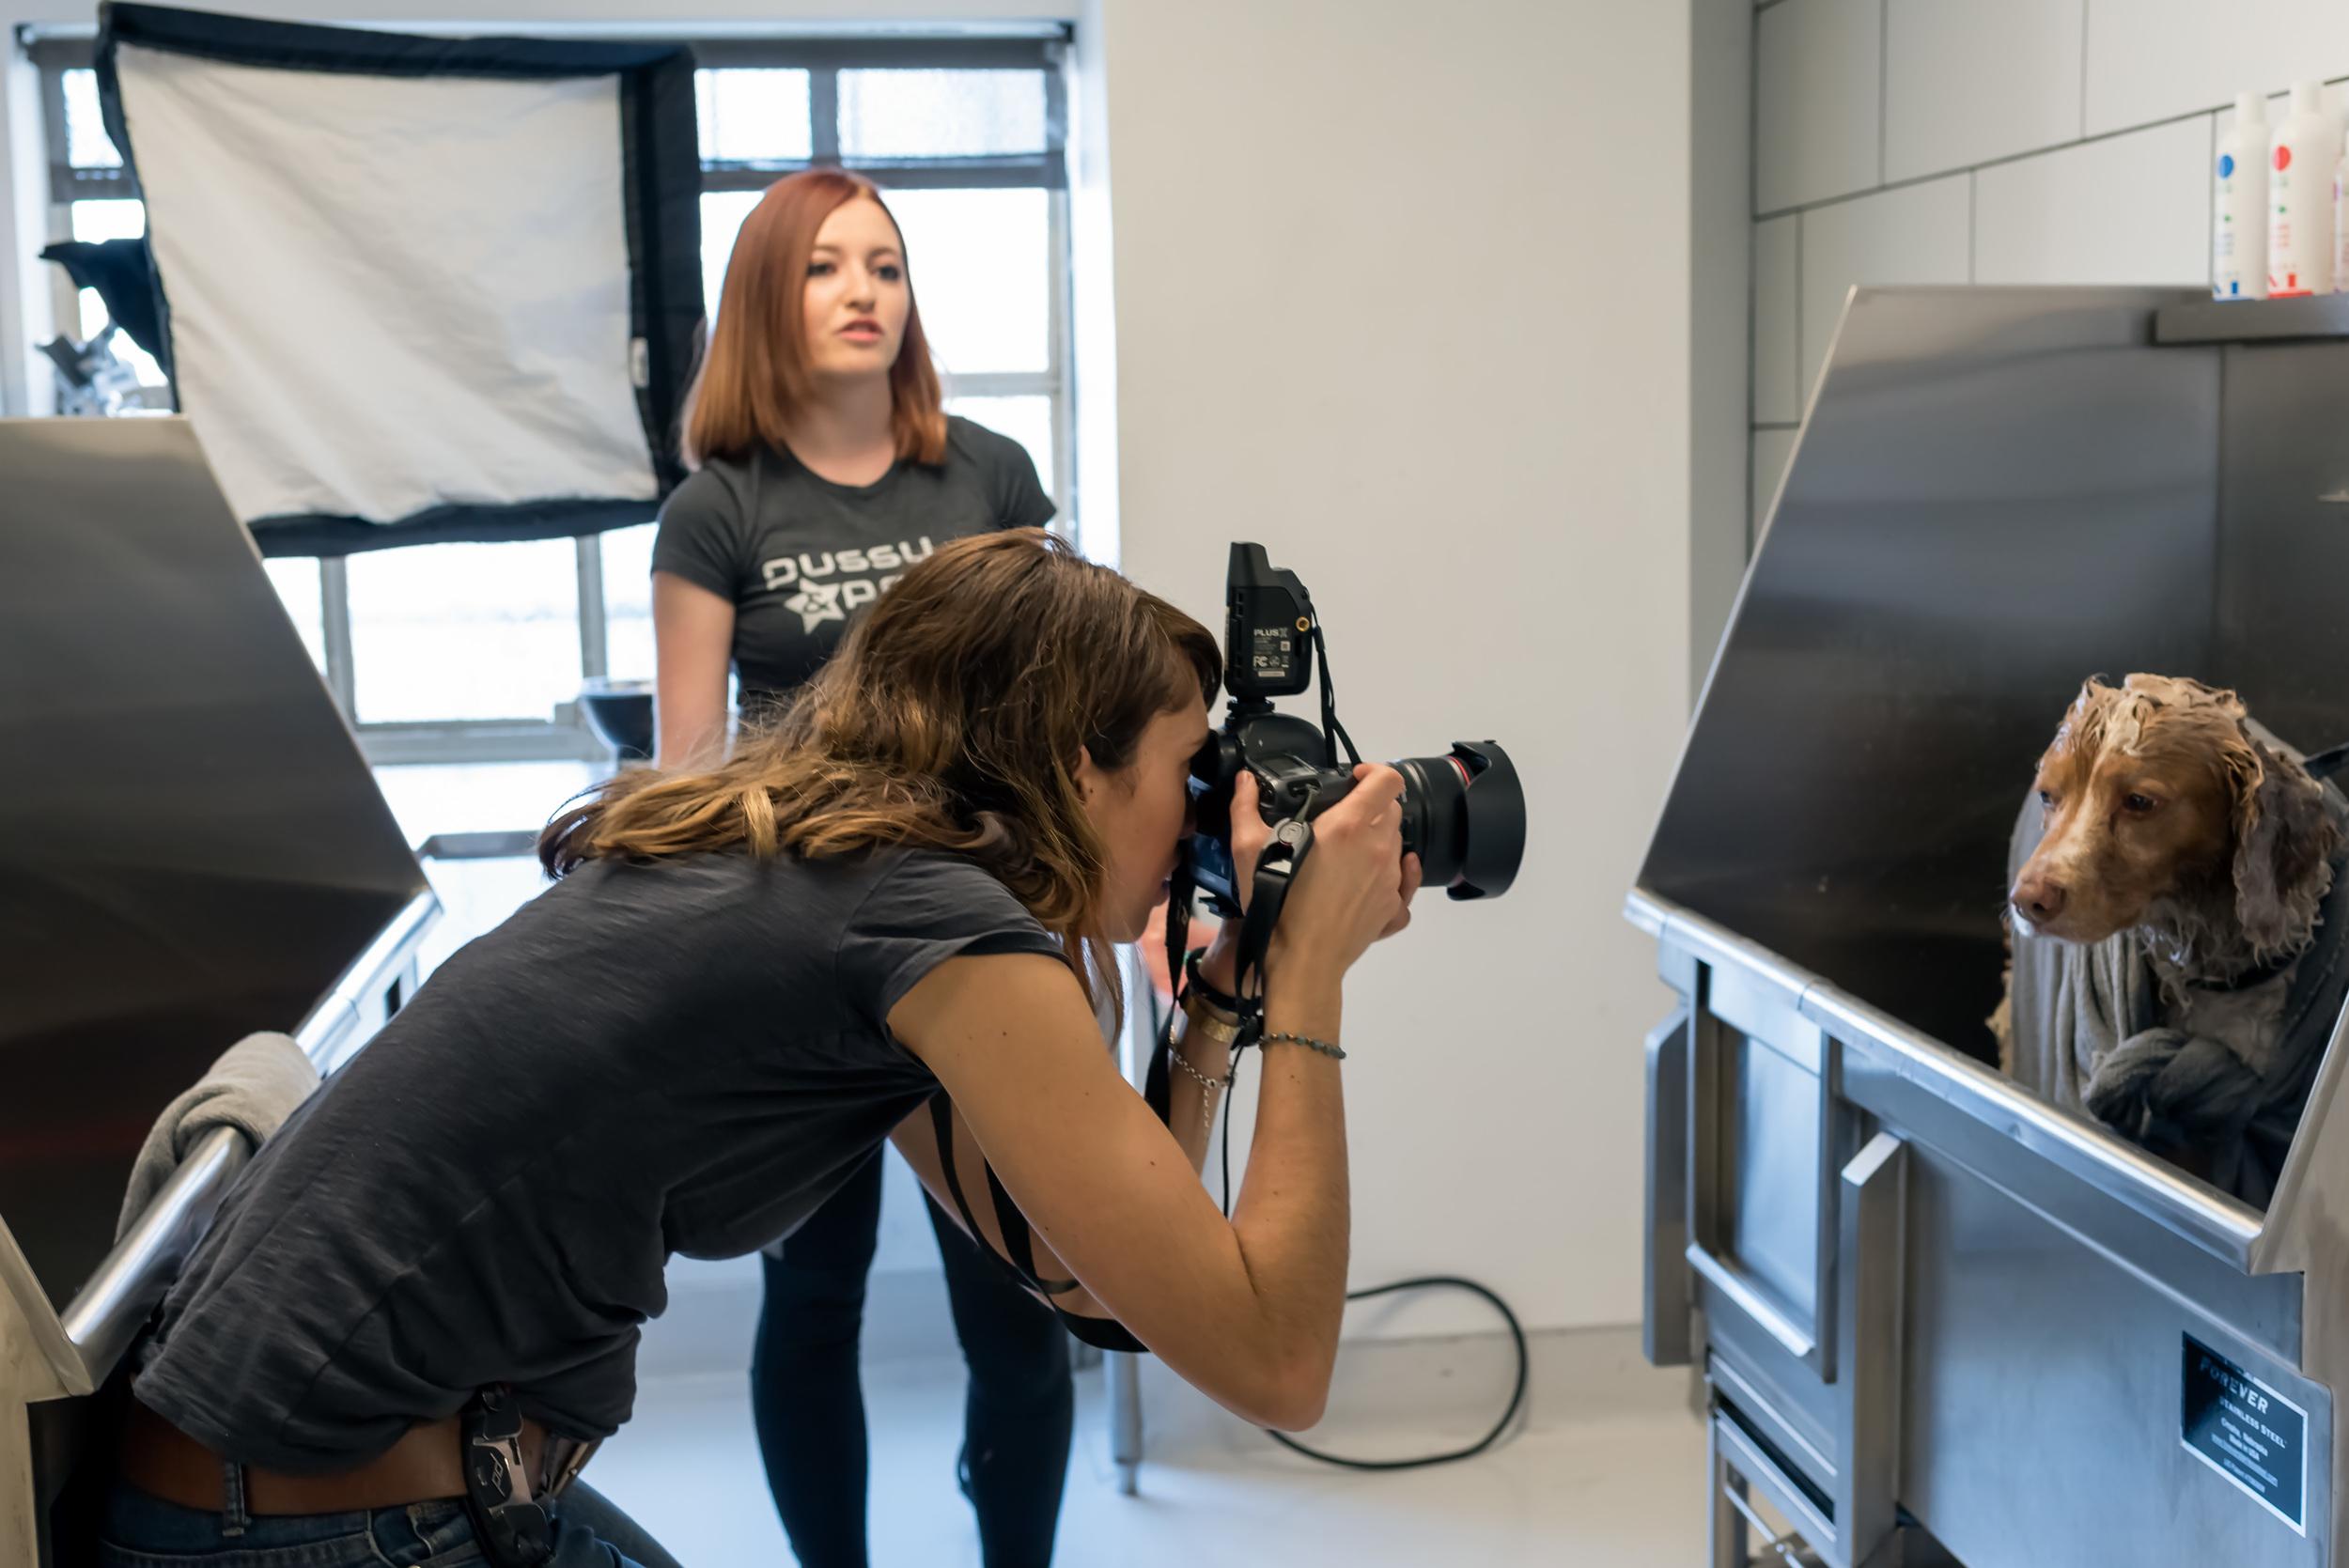 behind-the-scenes-dog-photographer-working-on-set-7.jpg